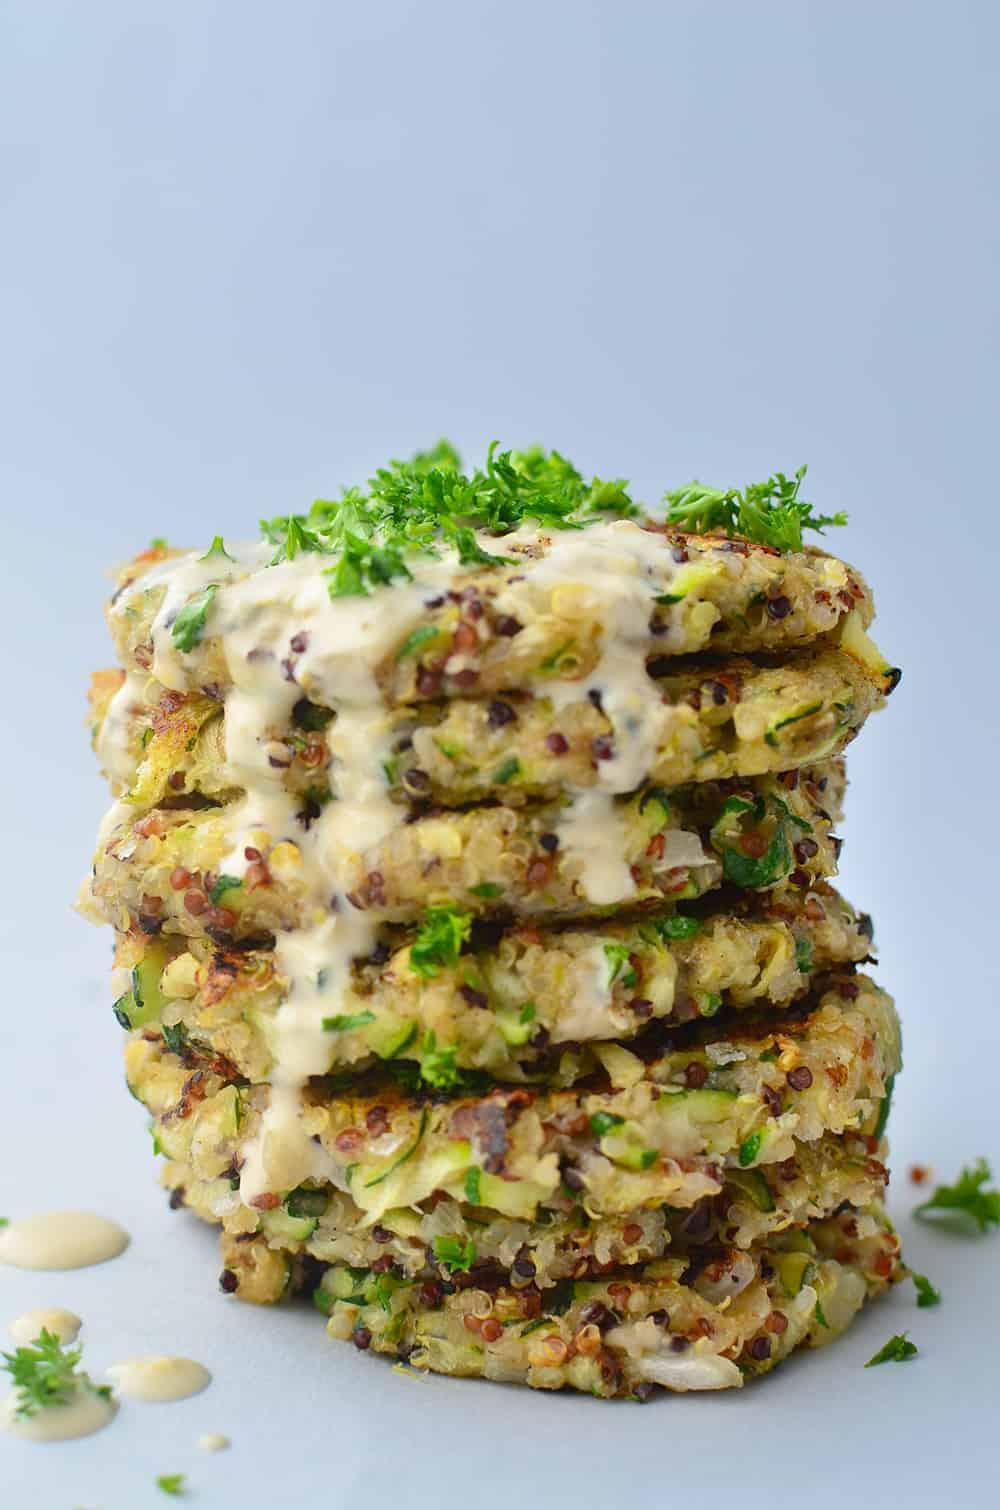 Greek Quinoa Zucchini Fritters! Crispy zucchini fritters with a garlic-hummus sauce. Perfect for leftover zucchini! | www.delishknowledge.com